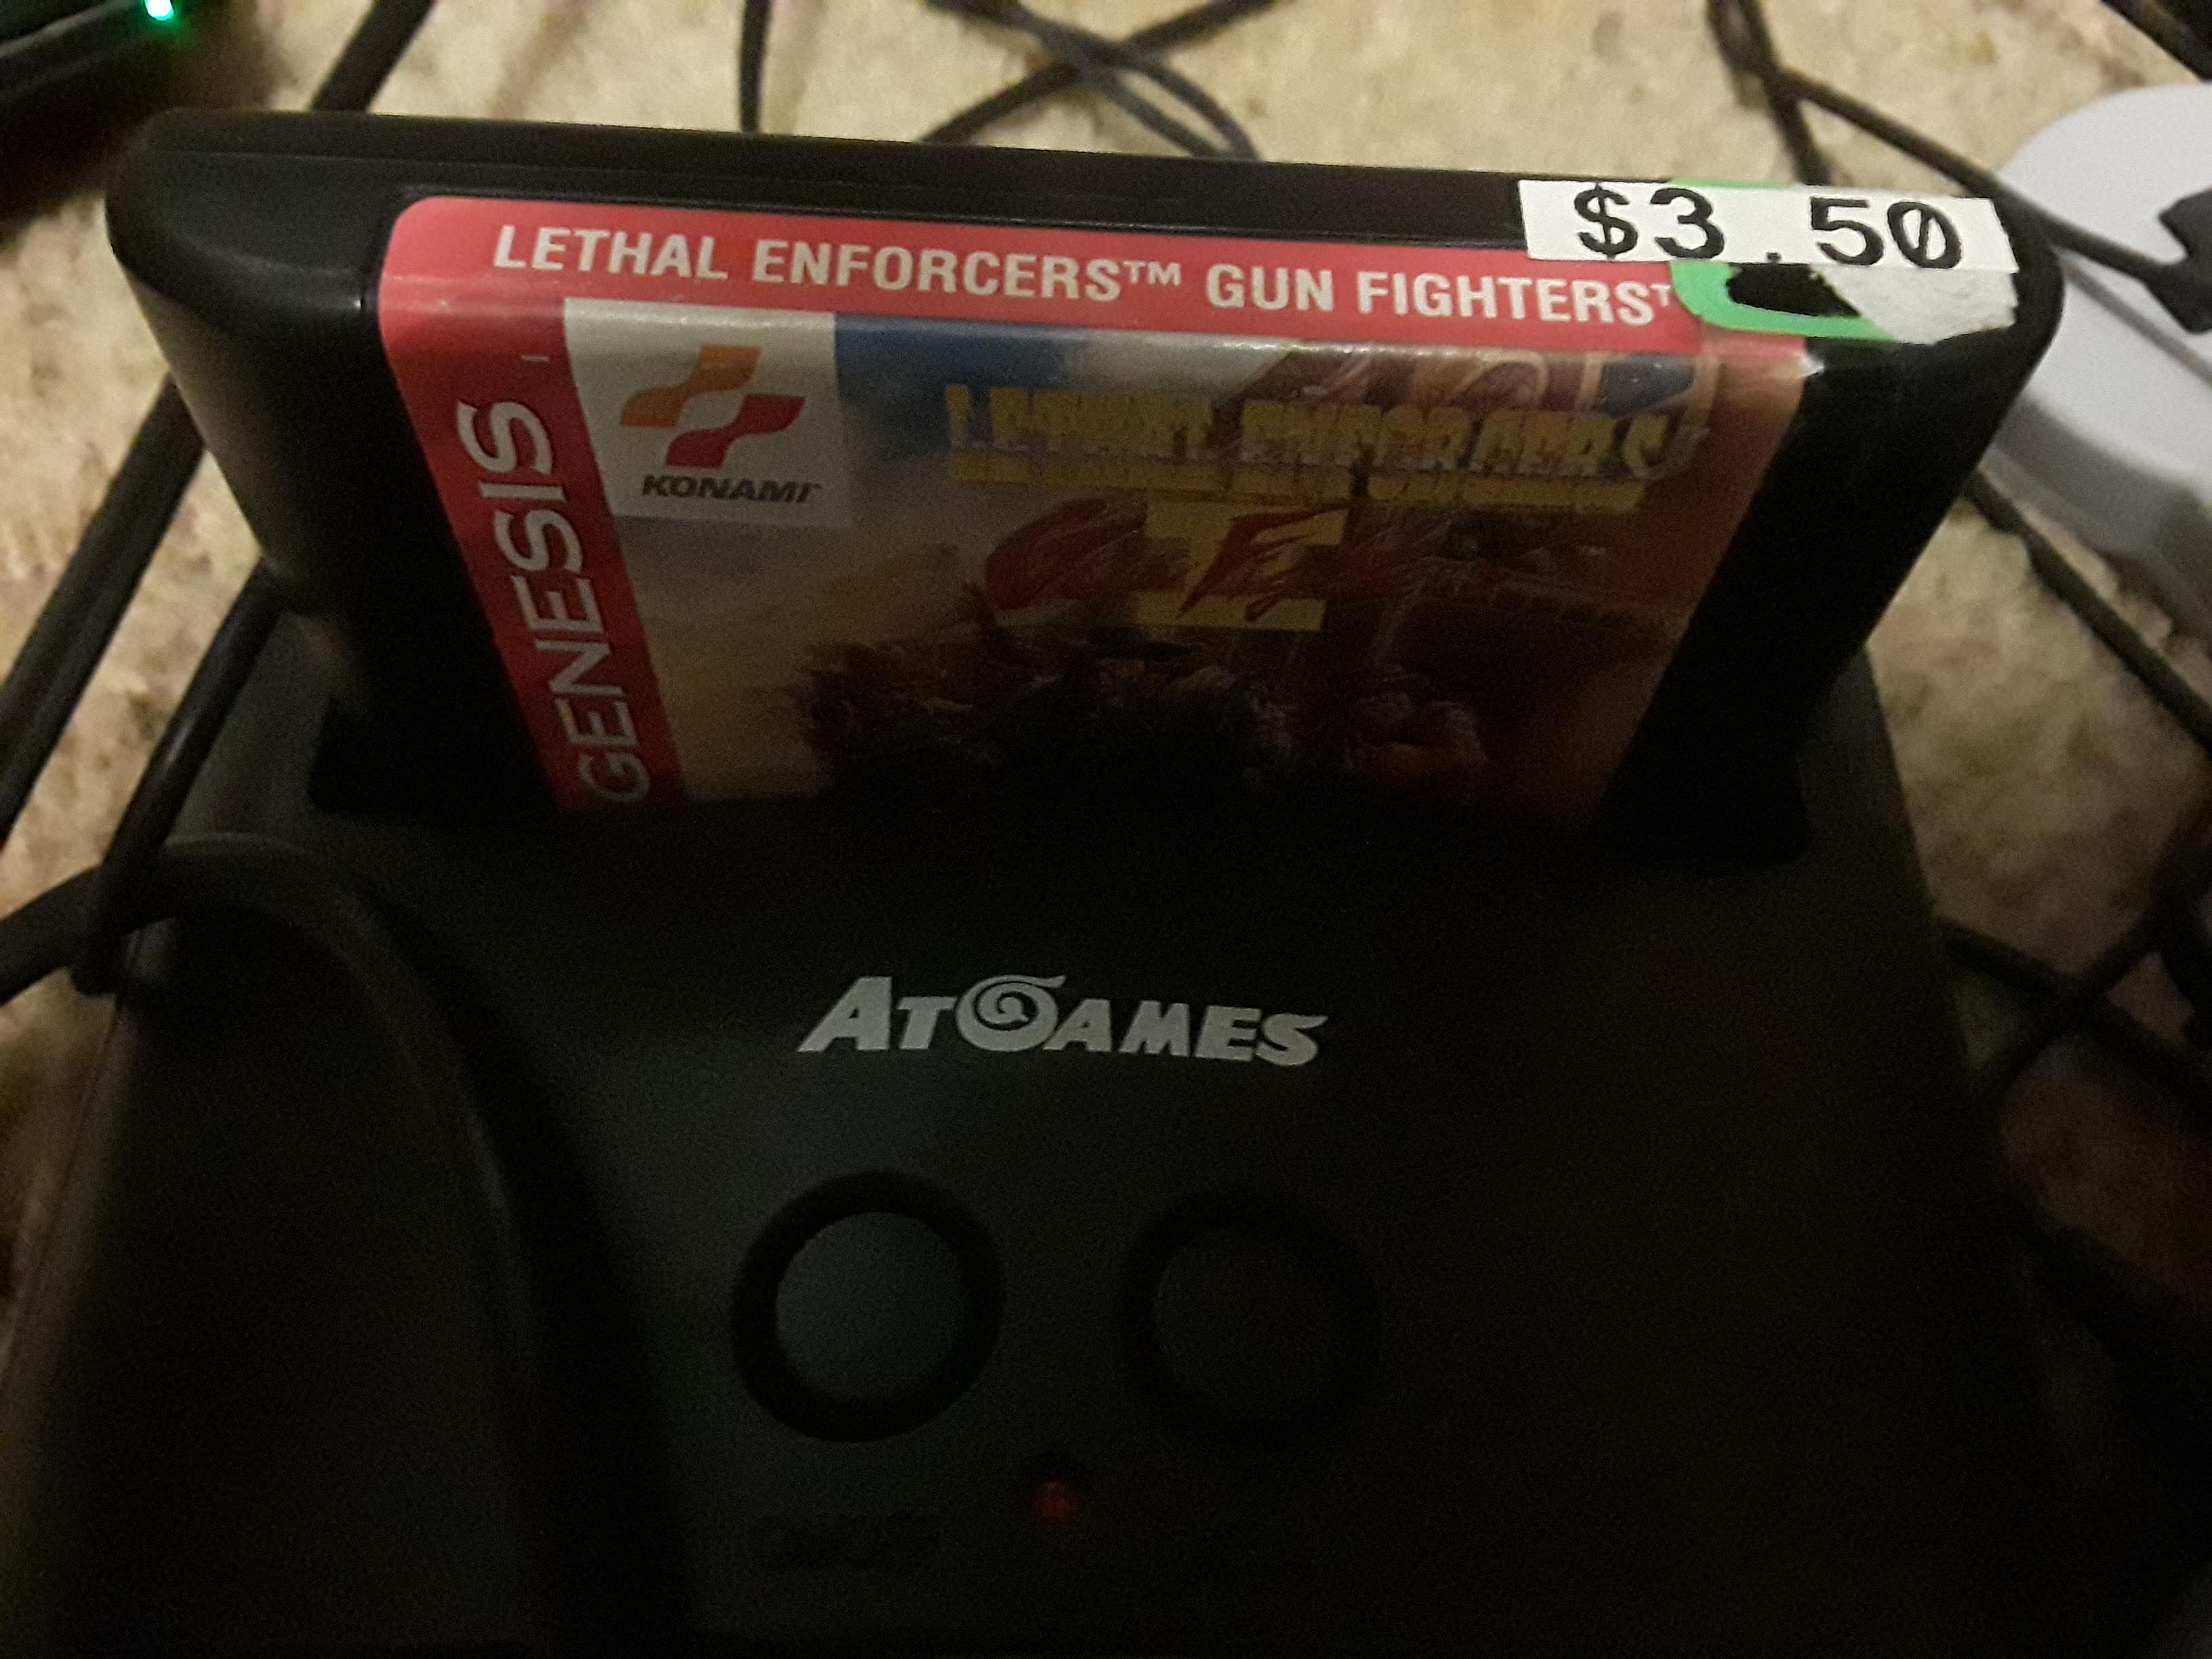 JML101582: Lethal Enforcers II: Gun Fighters [Easy] (Sega Genesis / MegaDrive Emulated) 936 points on 2019-02-23 19:59:17